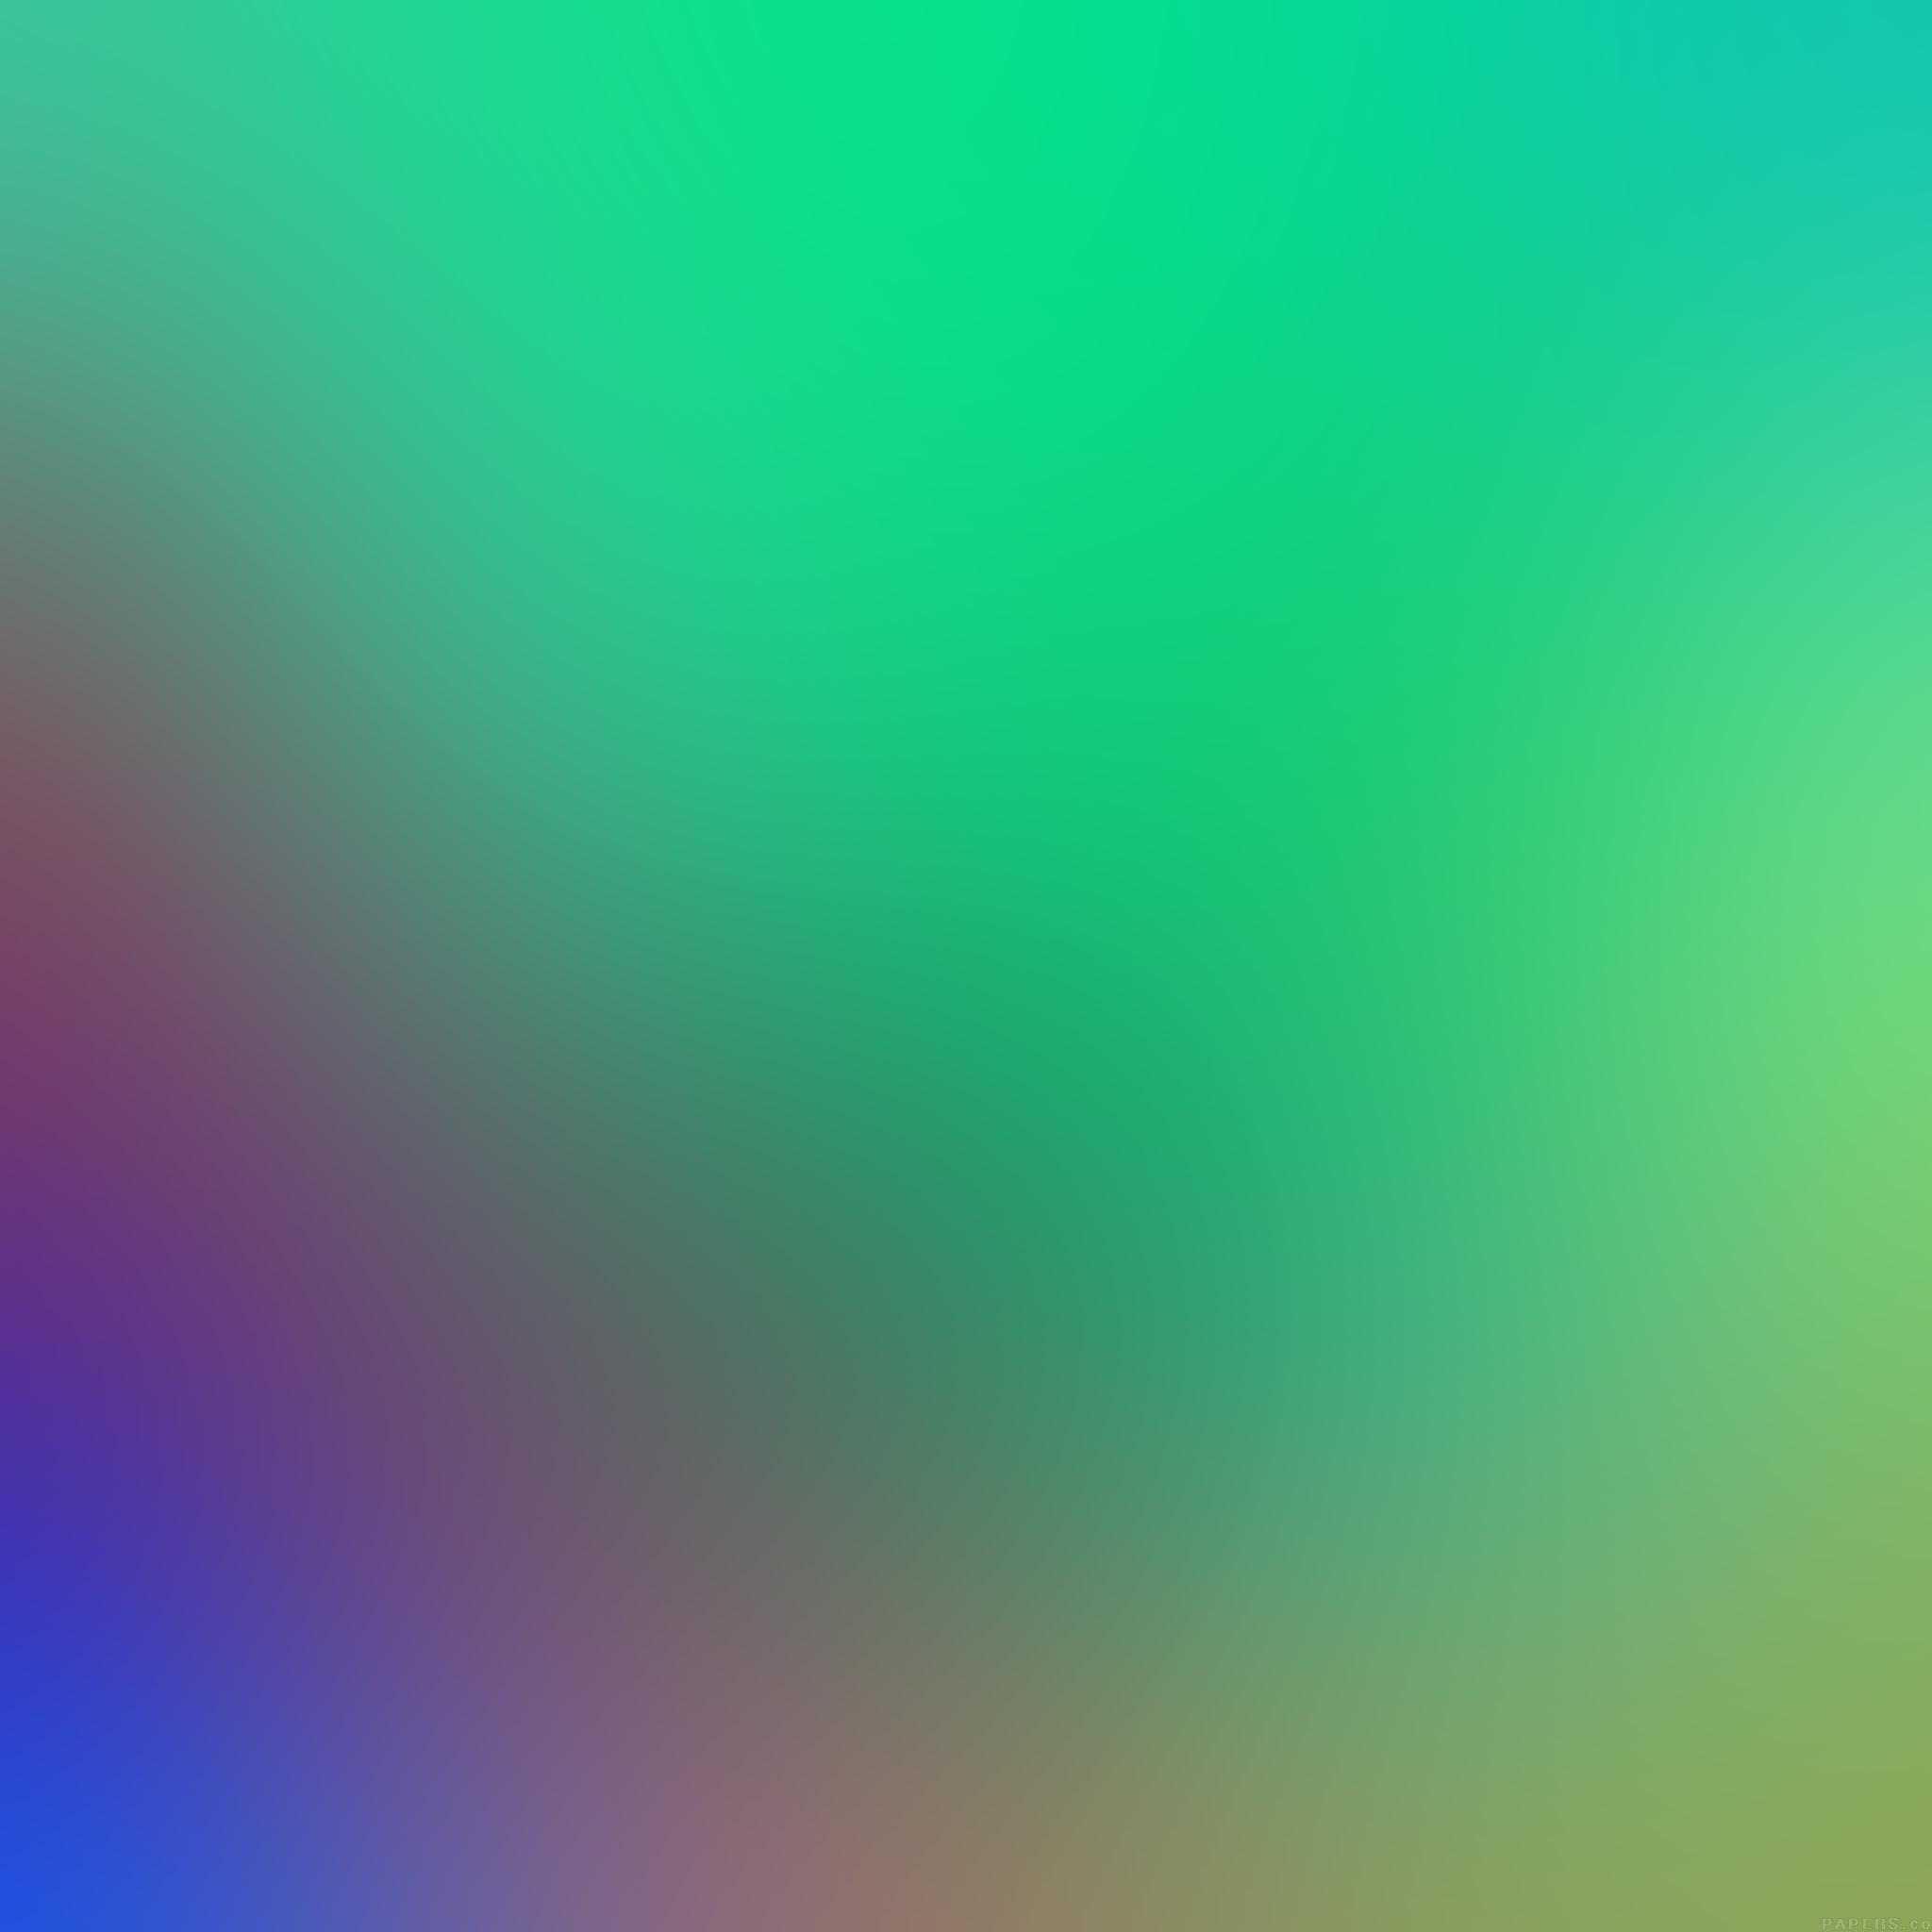 Iphone Se Fall Colors Wallpaper Wallpapers